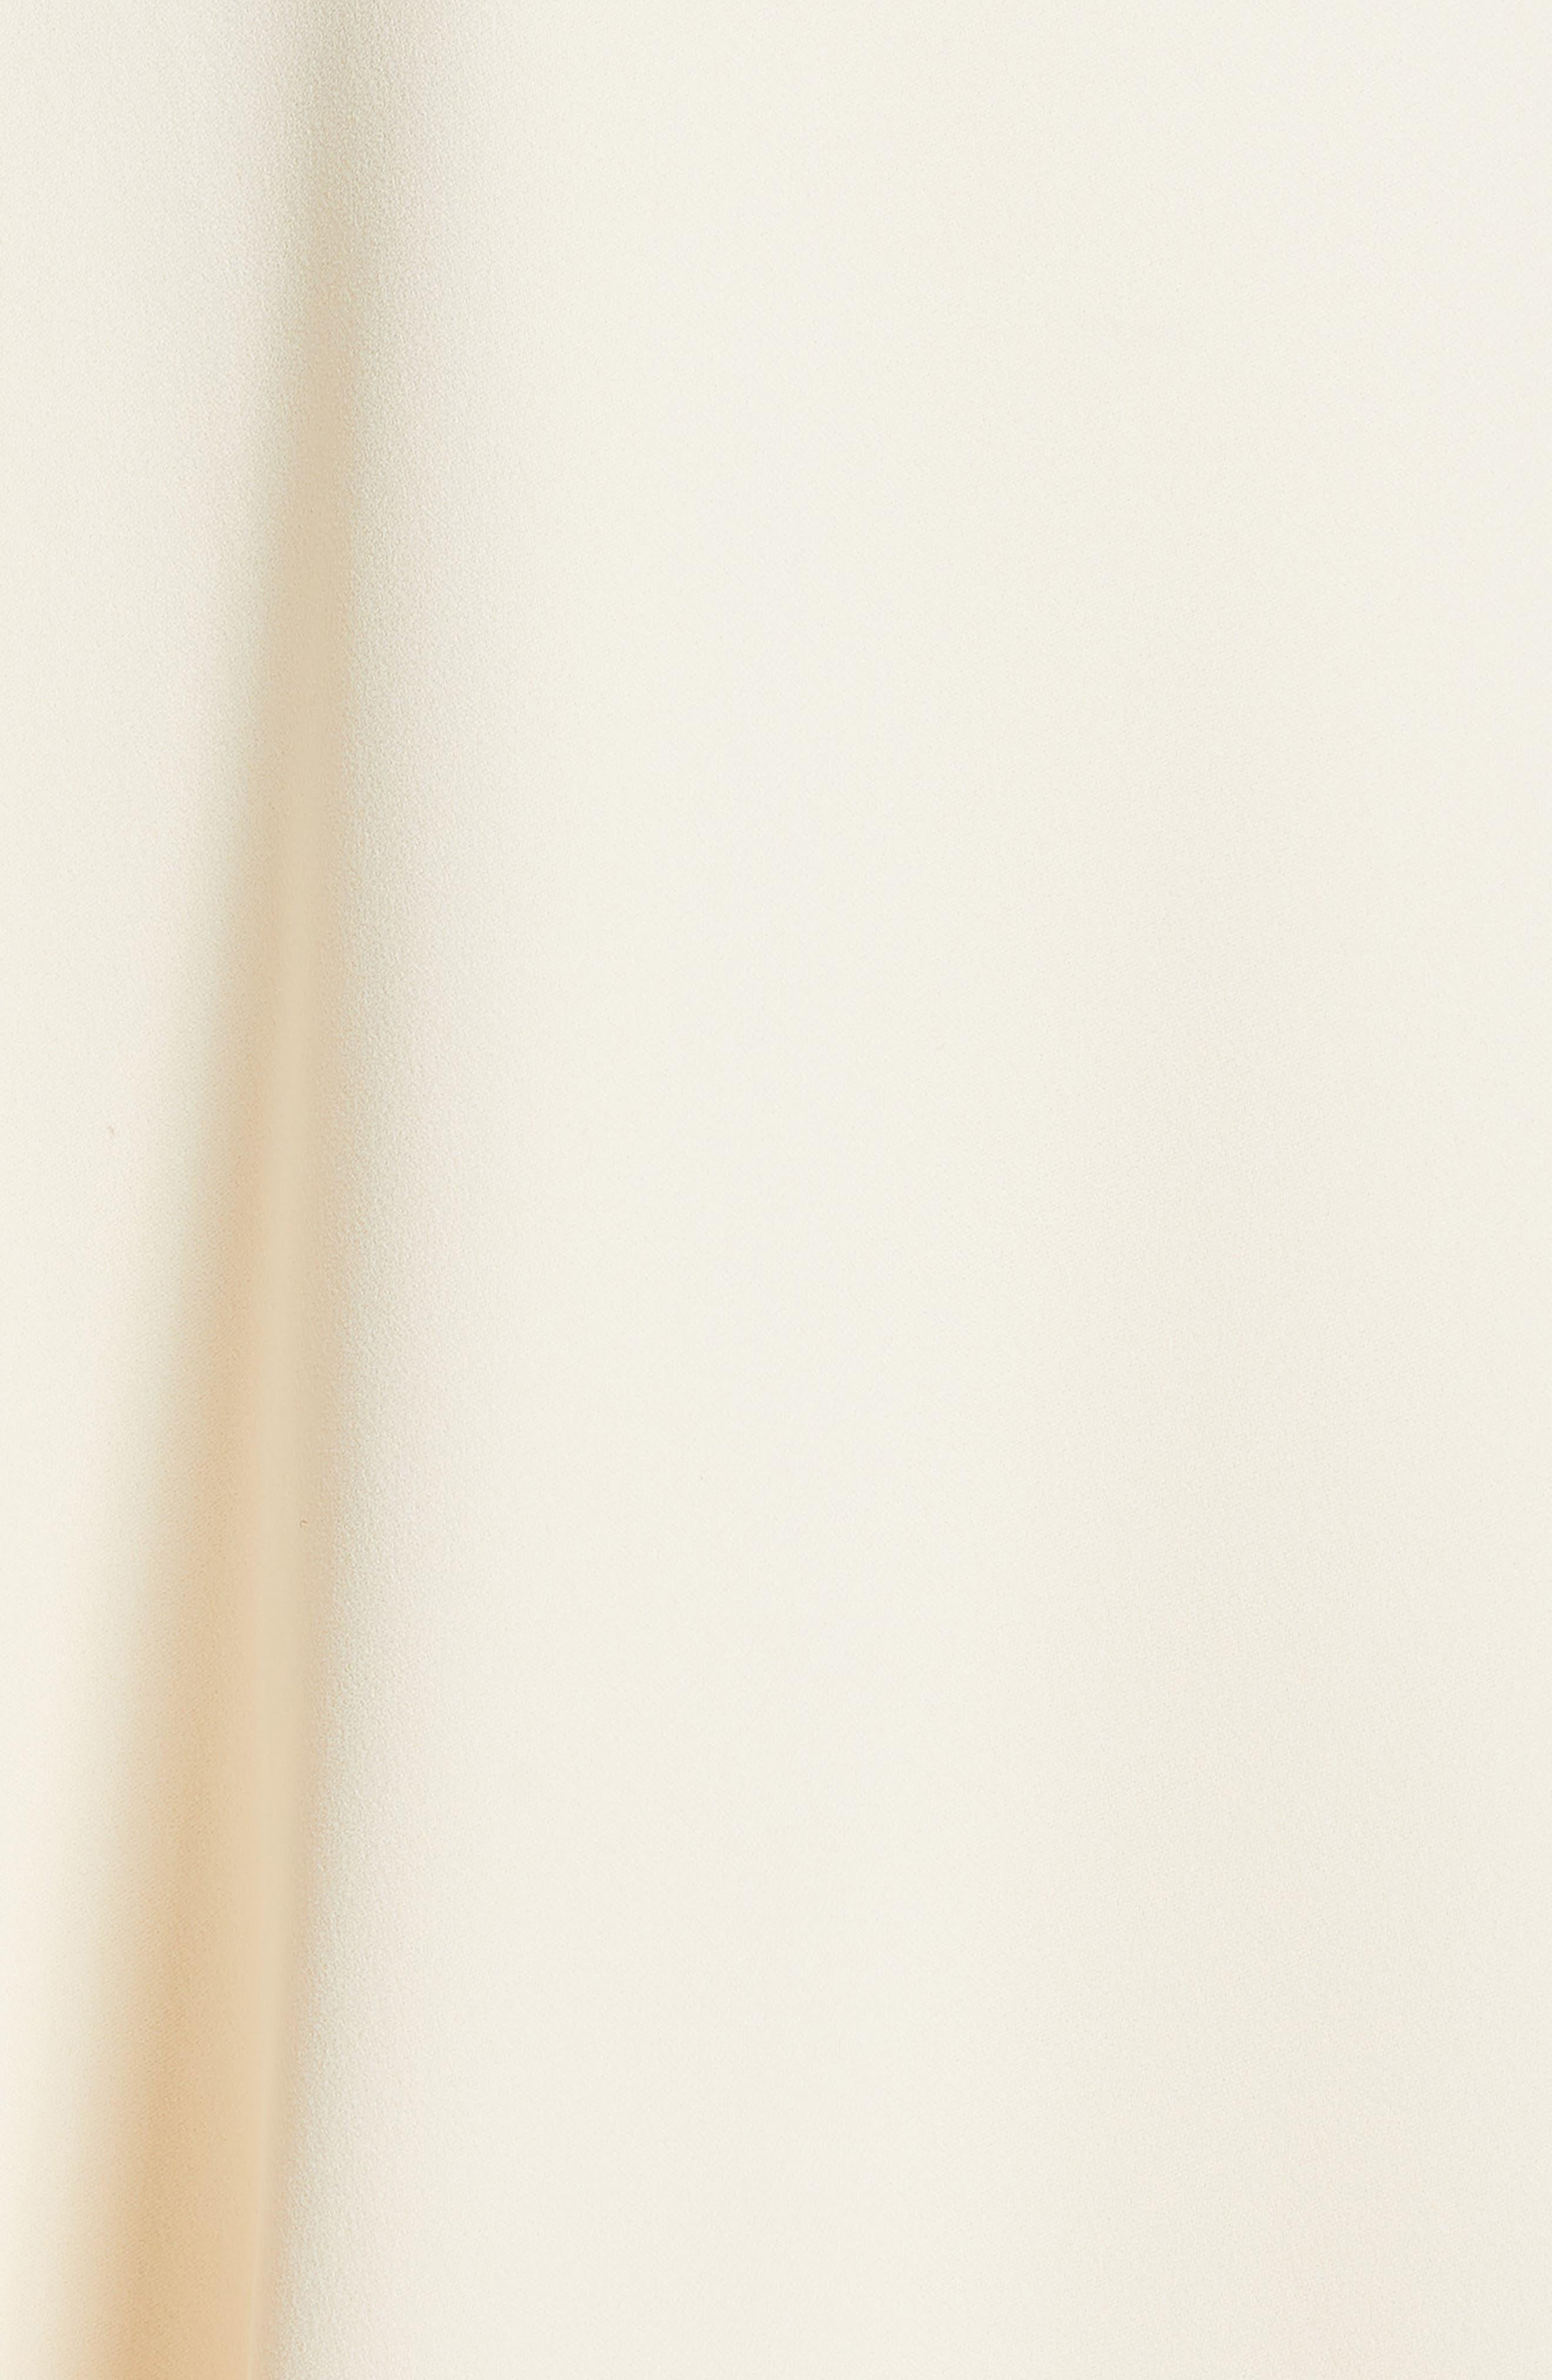 VICTORIA BECKHAM, Leather Trim Midi Skirt, Alternate thumbnail 5, color, MILK/ BLACK